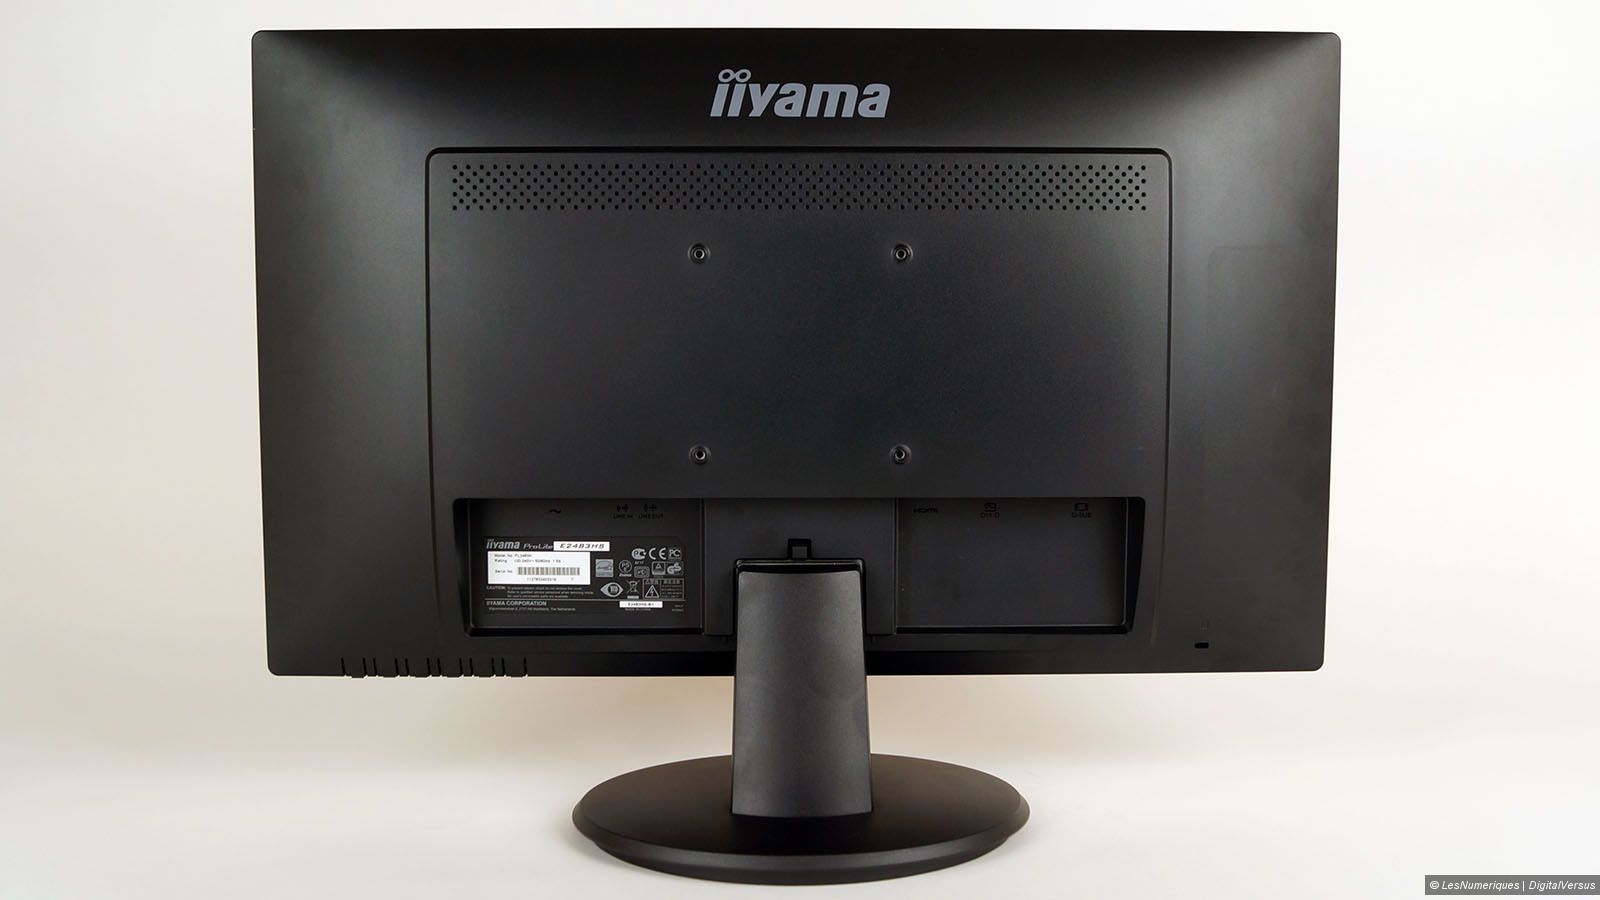 Iiyama prolite e2483hs b1 test complet ecran lcd pour for Test ecran photo